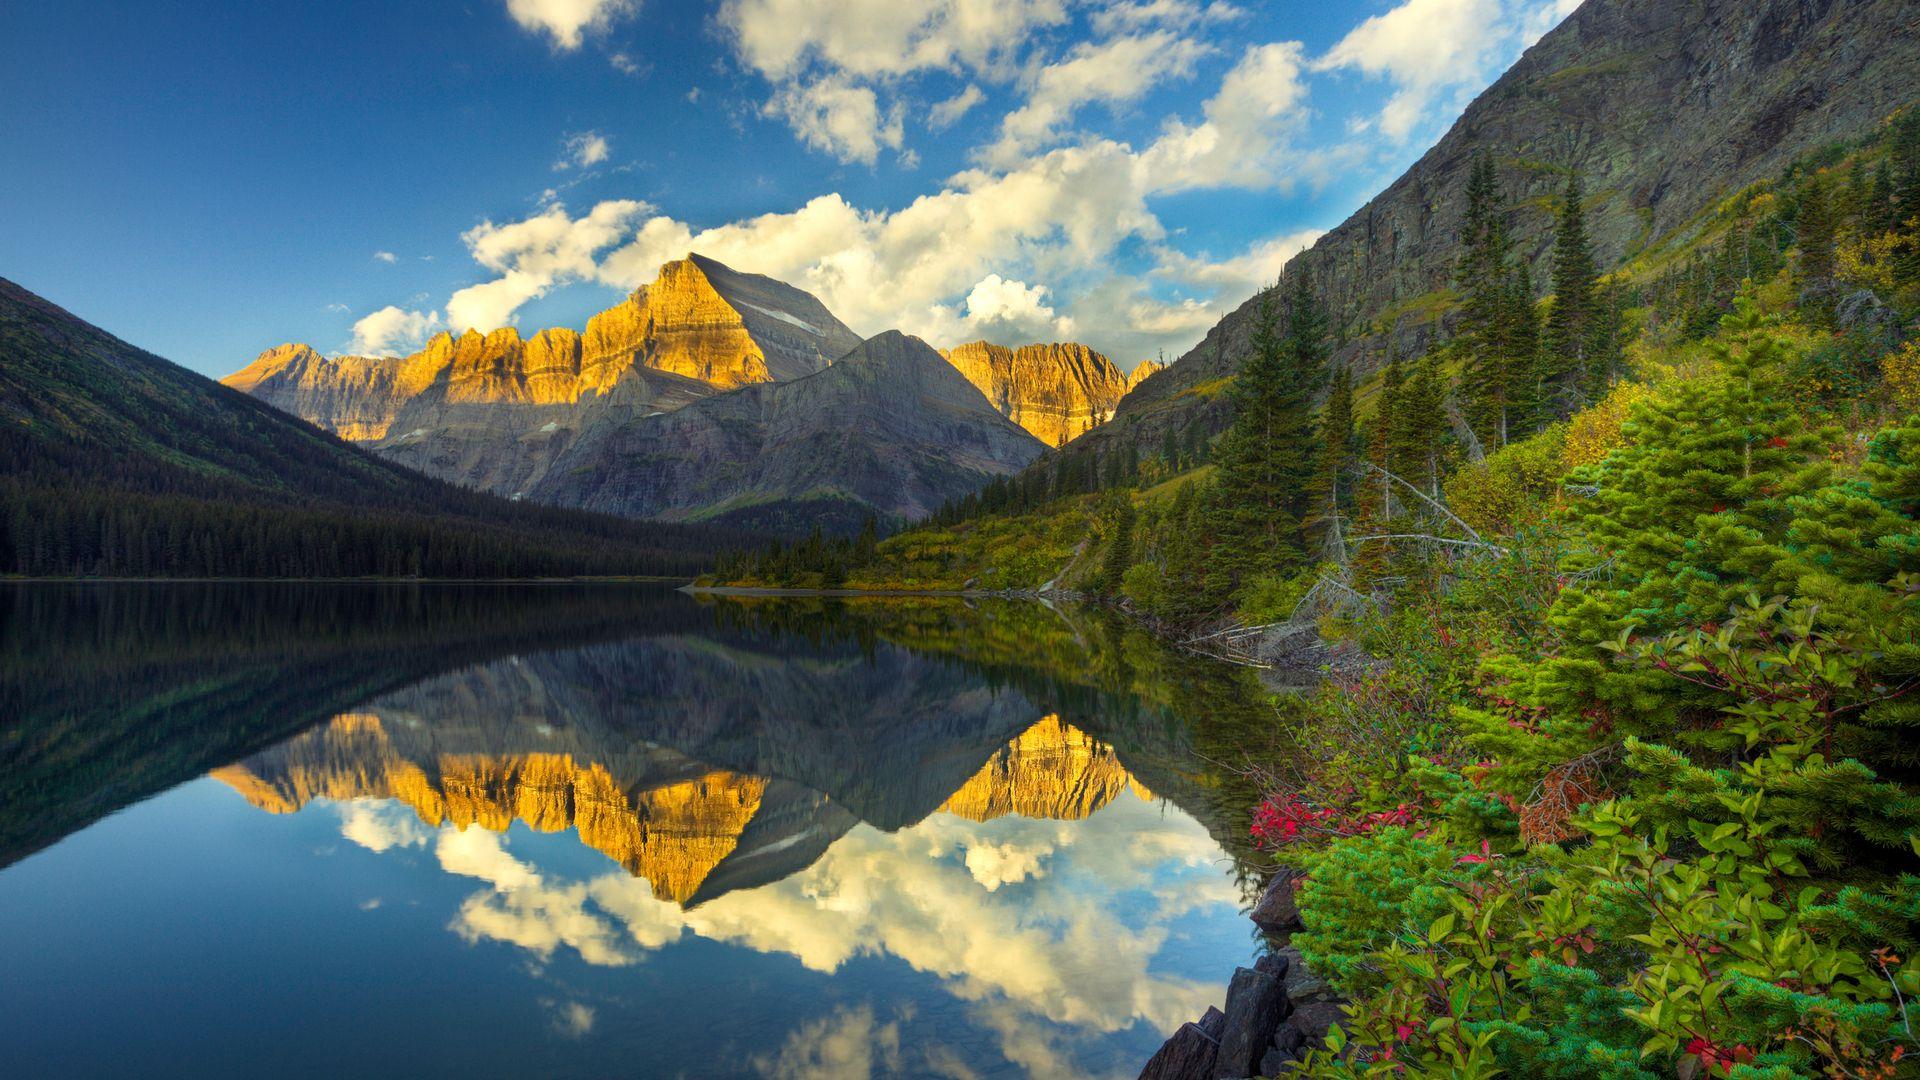 Mount Gould in Glacier National Park, Montana.